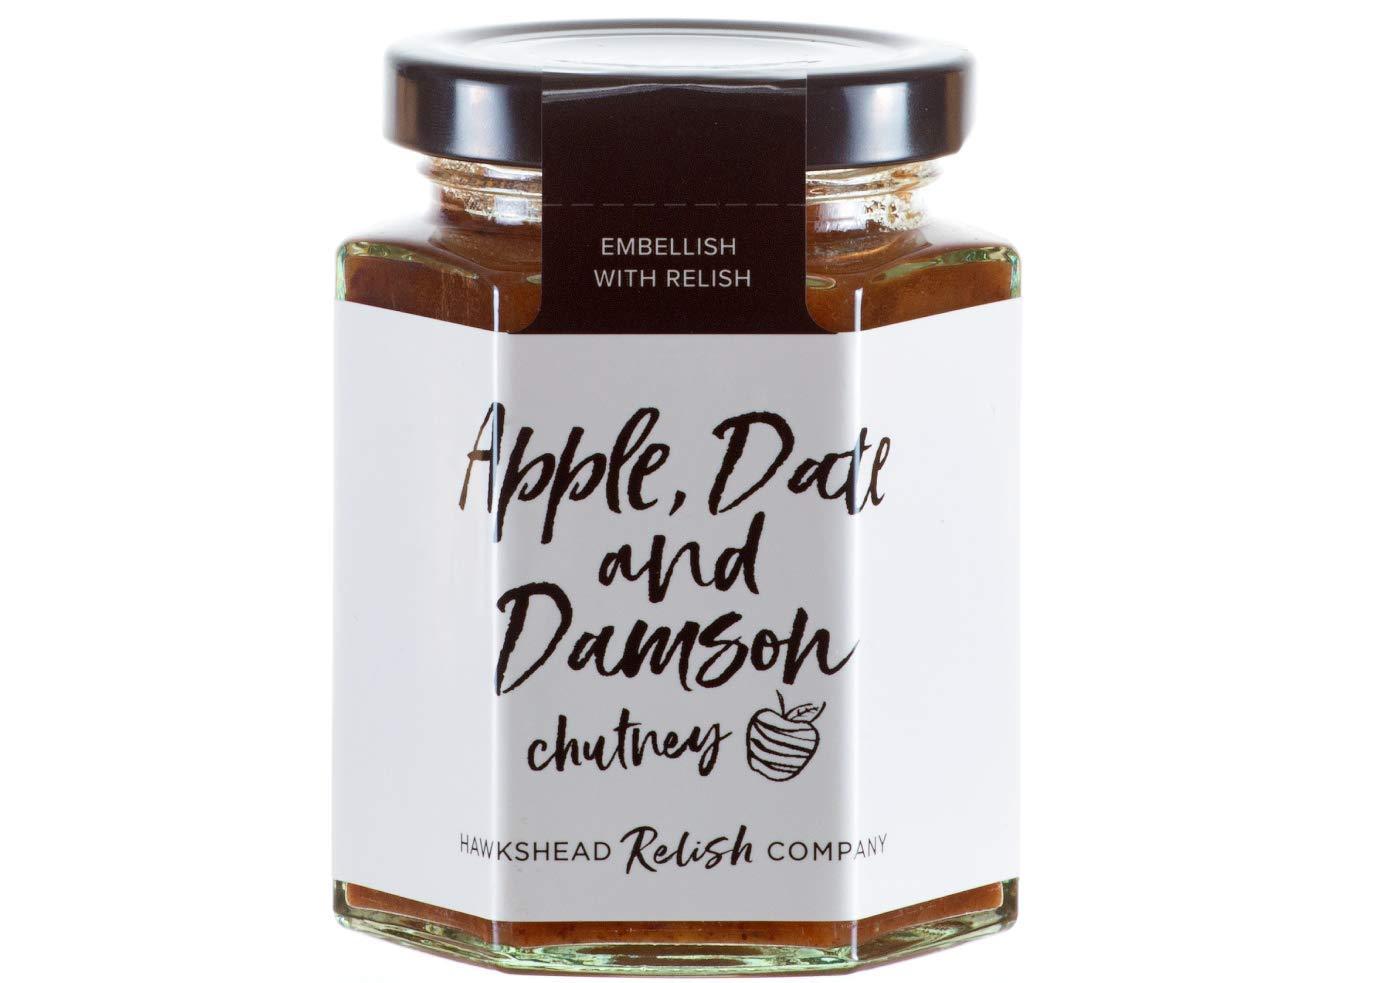 Hawkshead Relish Co - Apple Date/Damson Chutney